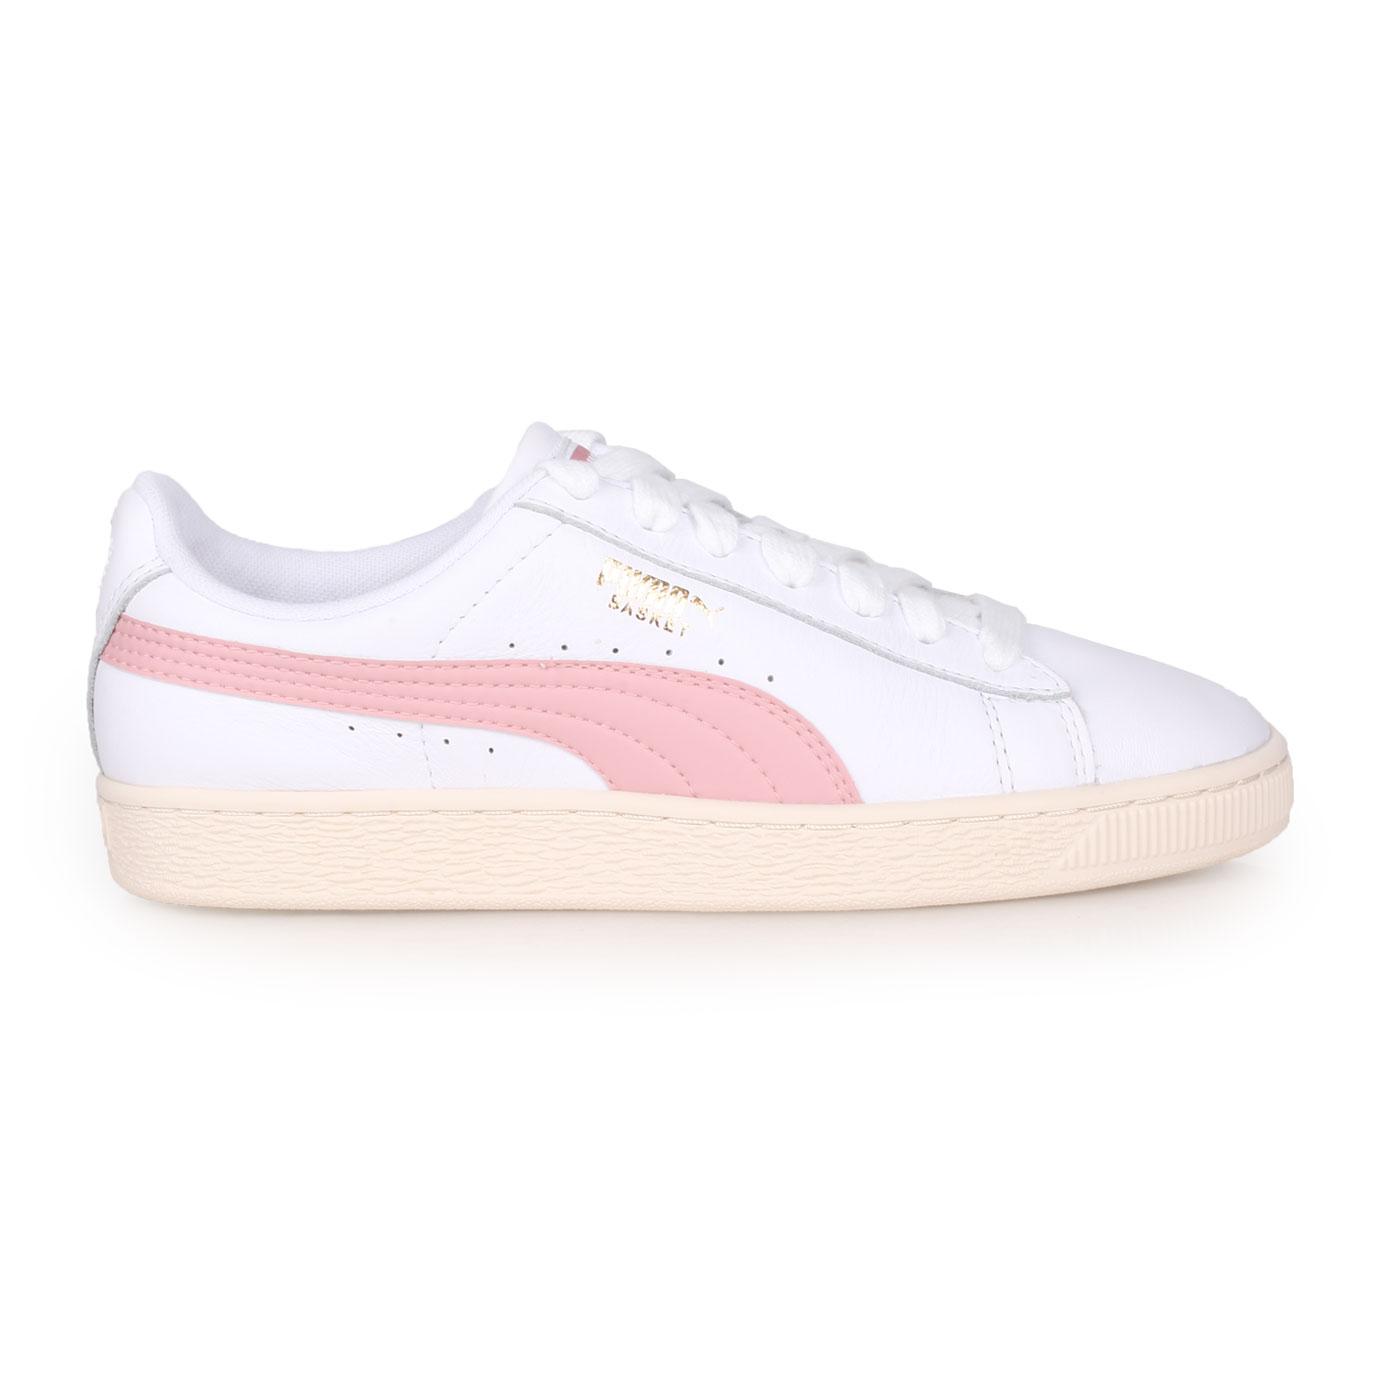 PUMA 經典復古休閒鞋  @BASKET CLASSIC LFS@35436717 - 白粉